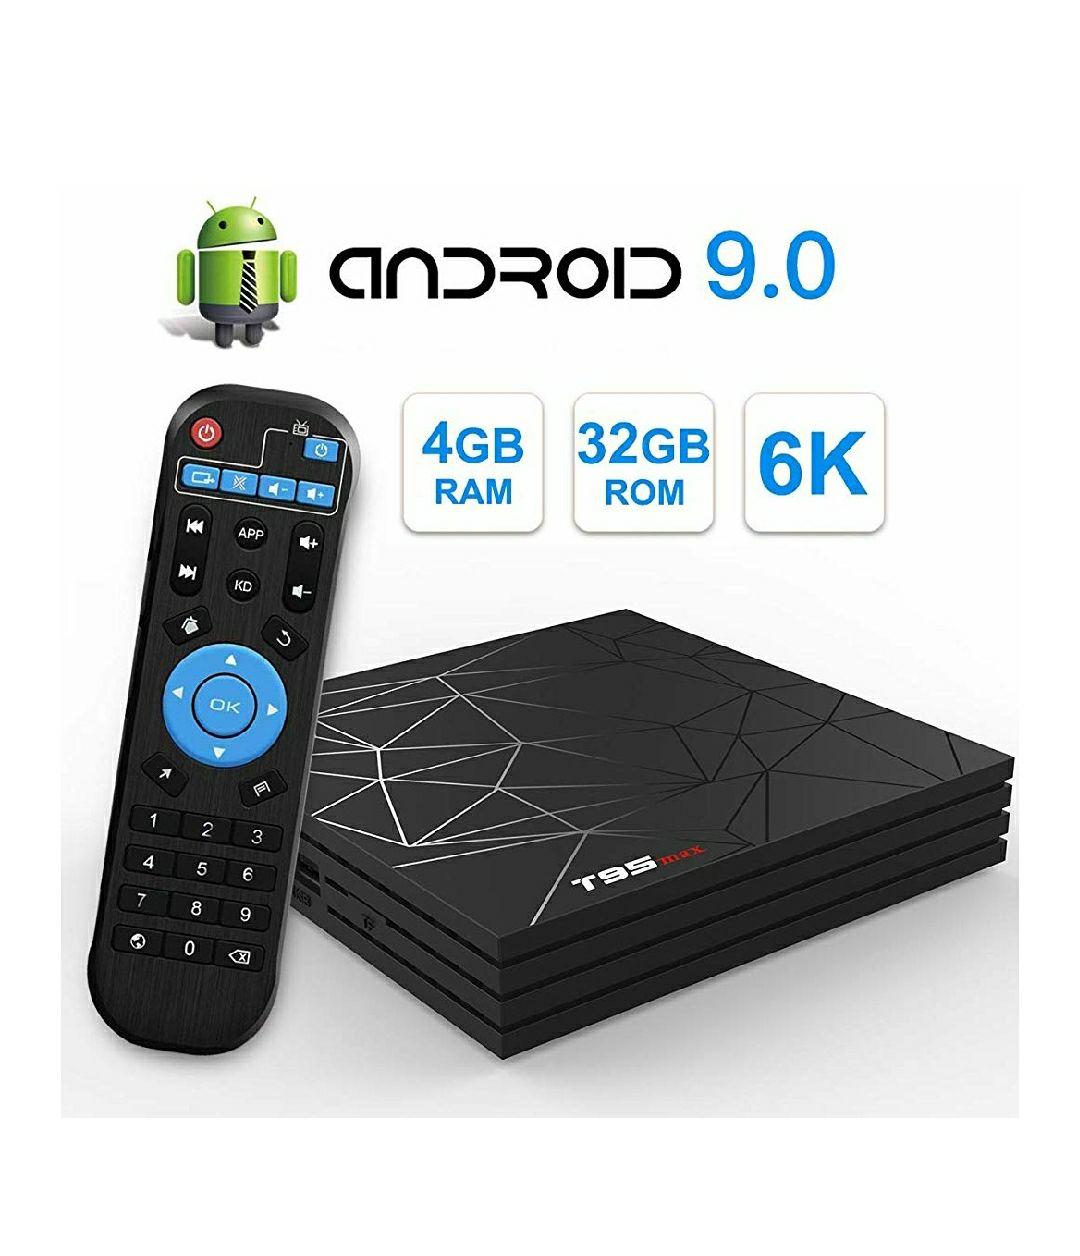 T95 MAX Android 9.0 TV Box 4GB RAM/32GB ROM